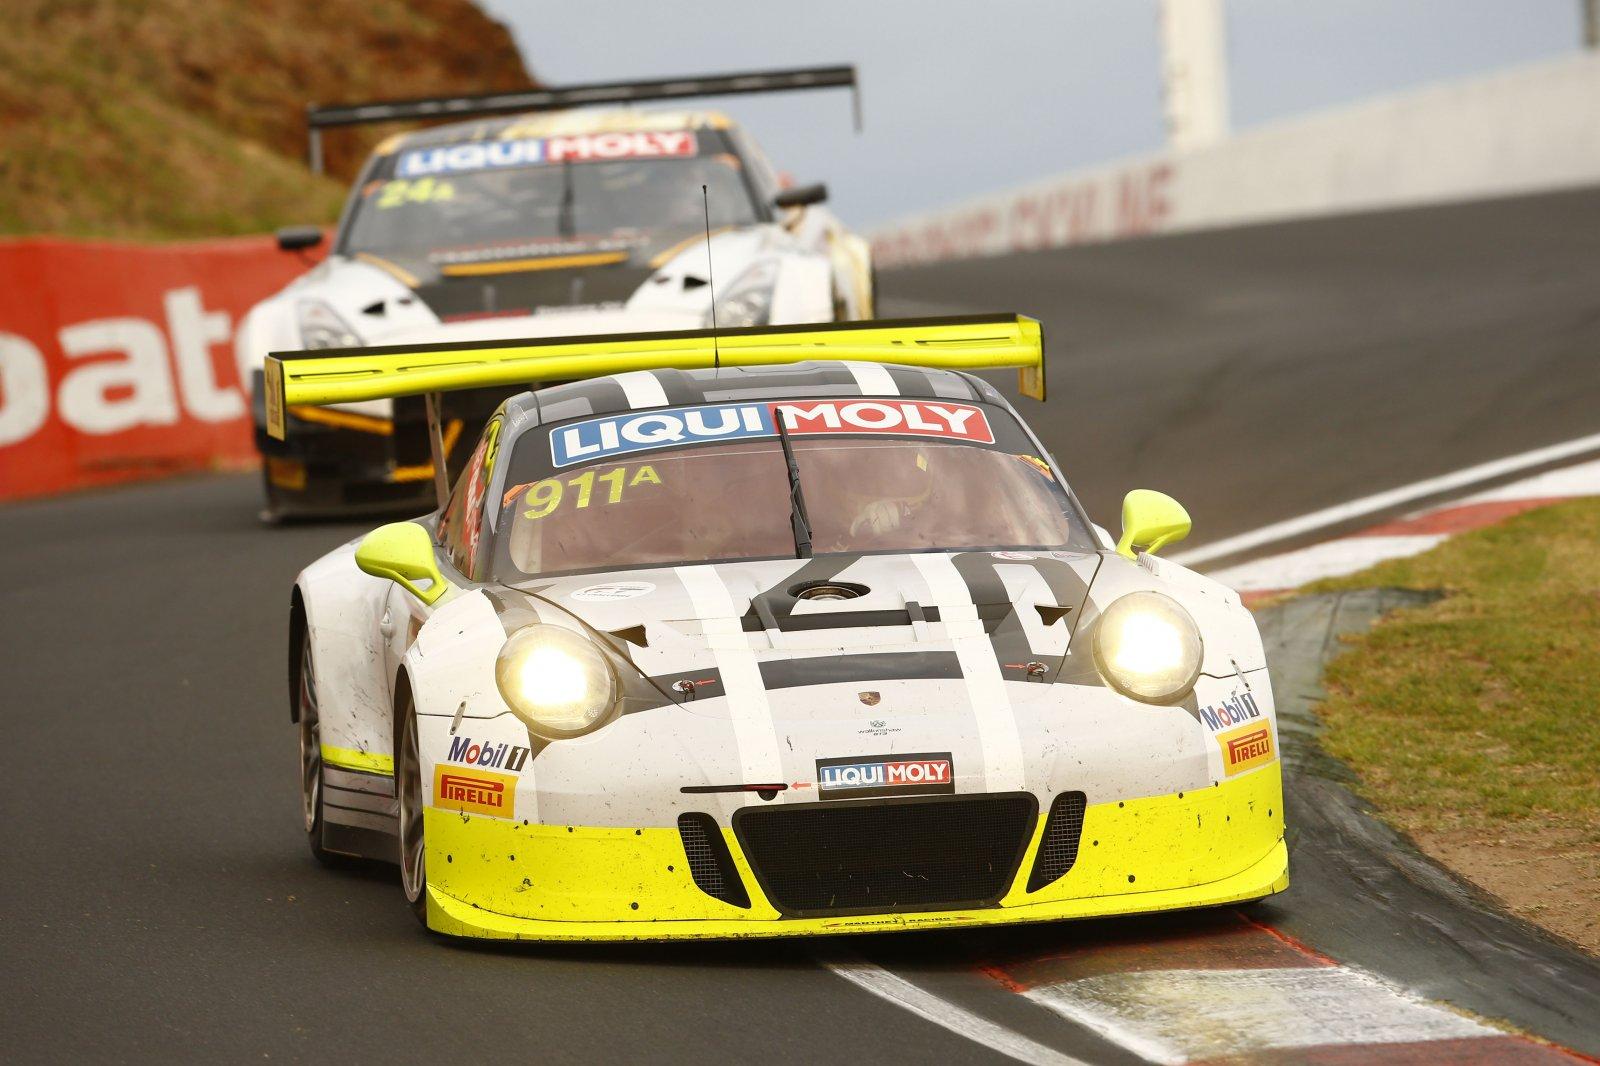 Porsche enters full Intercontinental GT Challenge season